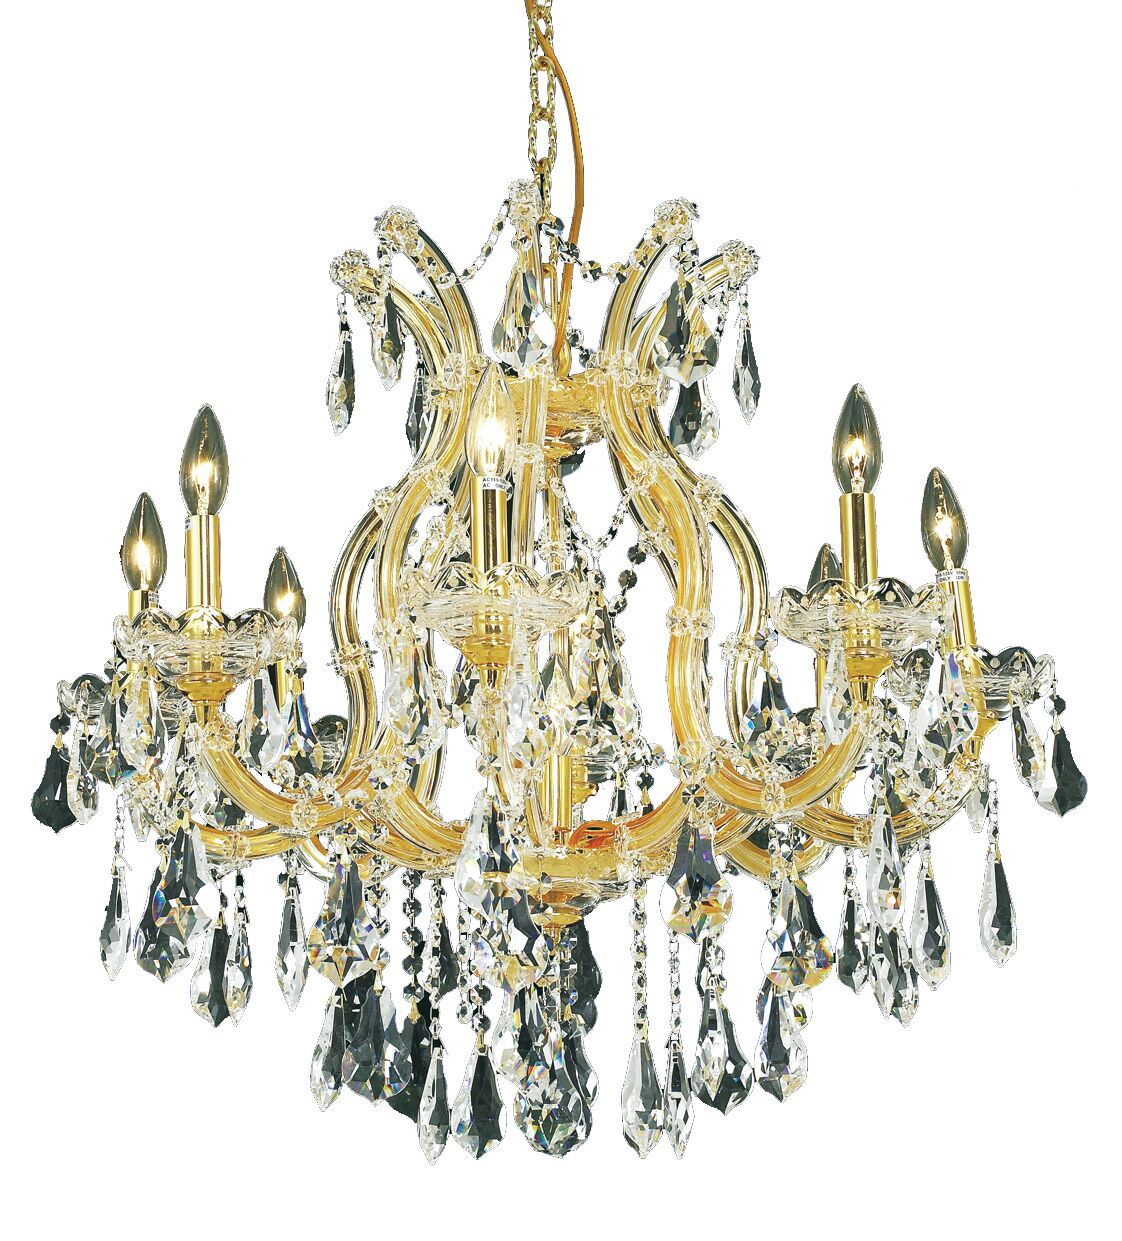 Regina 9-Light Royal Cut Candle Style Chandelier Finish / Crystal Finish / Crystal Trim: Chrome / Crystal (Clear) / Royal Cut